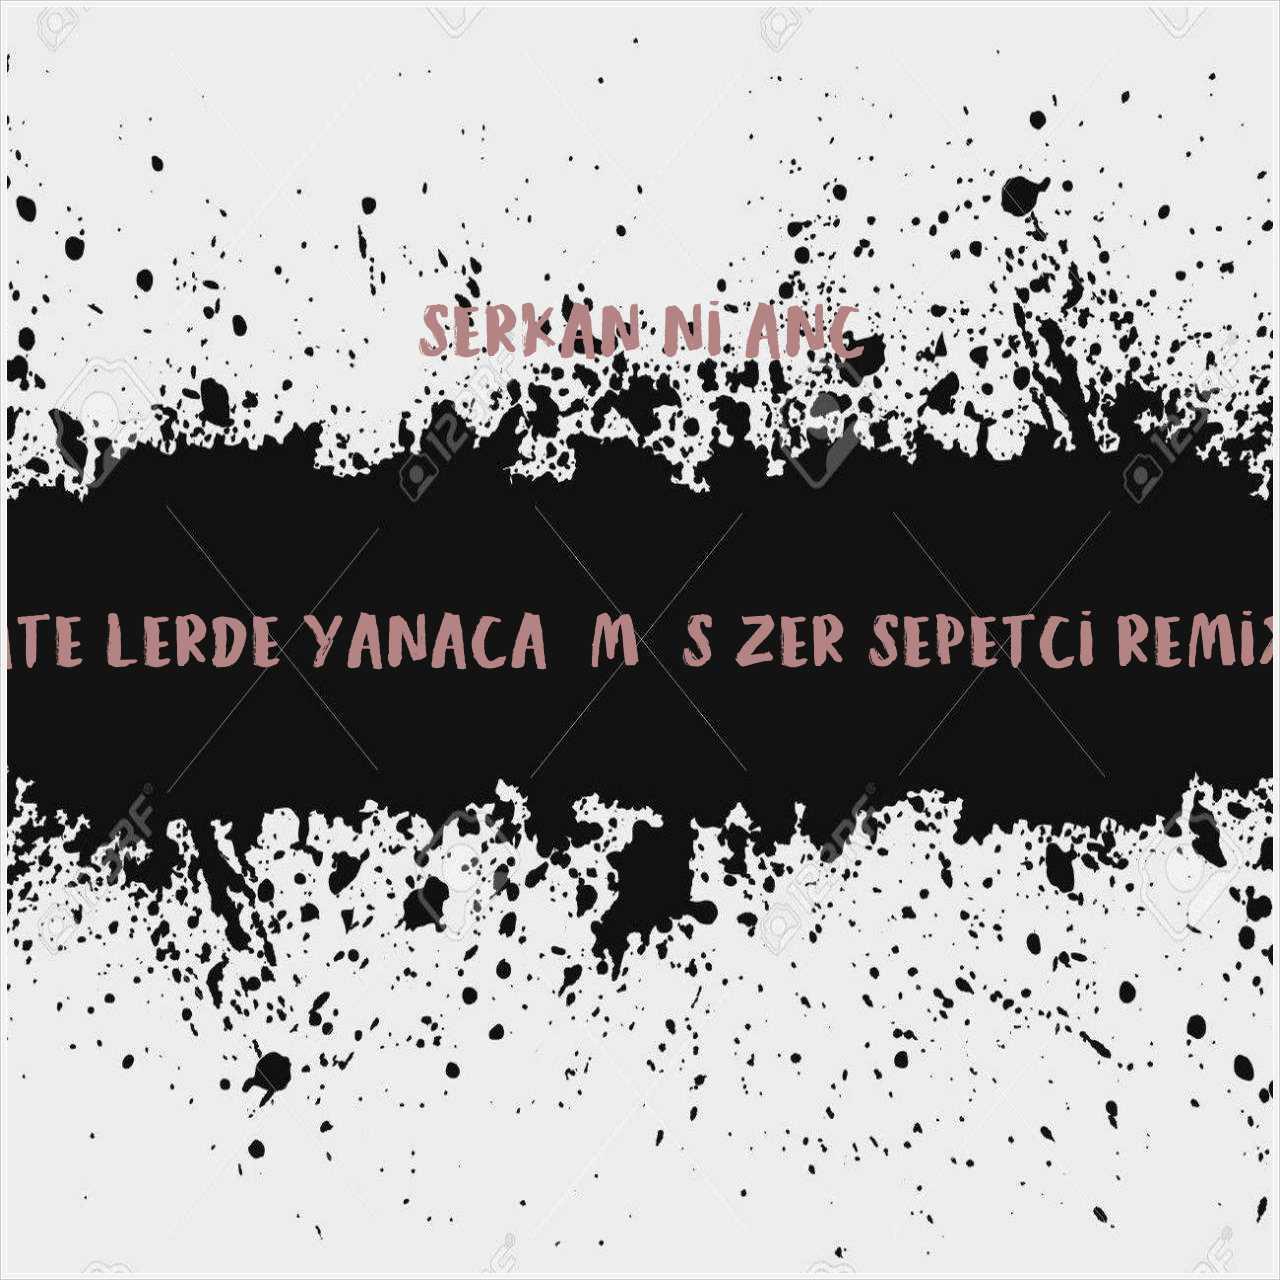 دانلود آهنگ جدید Serkan Nişancı به نام Ateşlerde Yanacağım (Sözer Sepetci Remix)